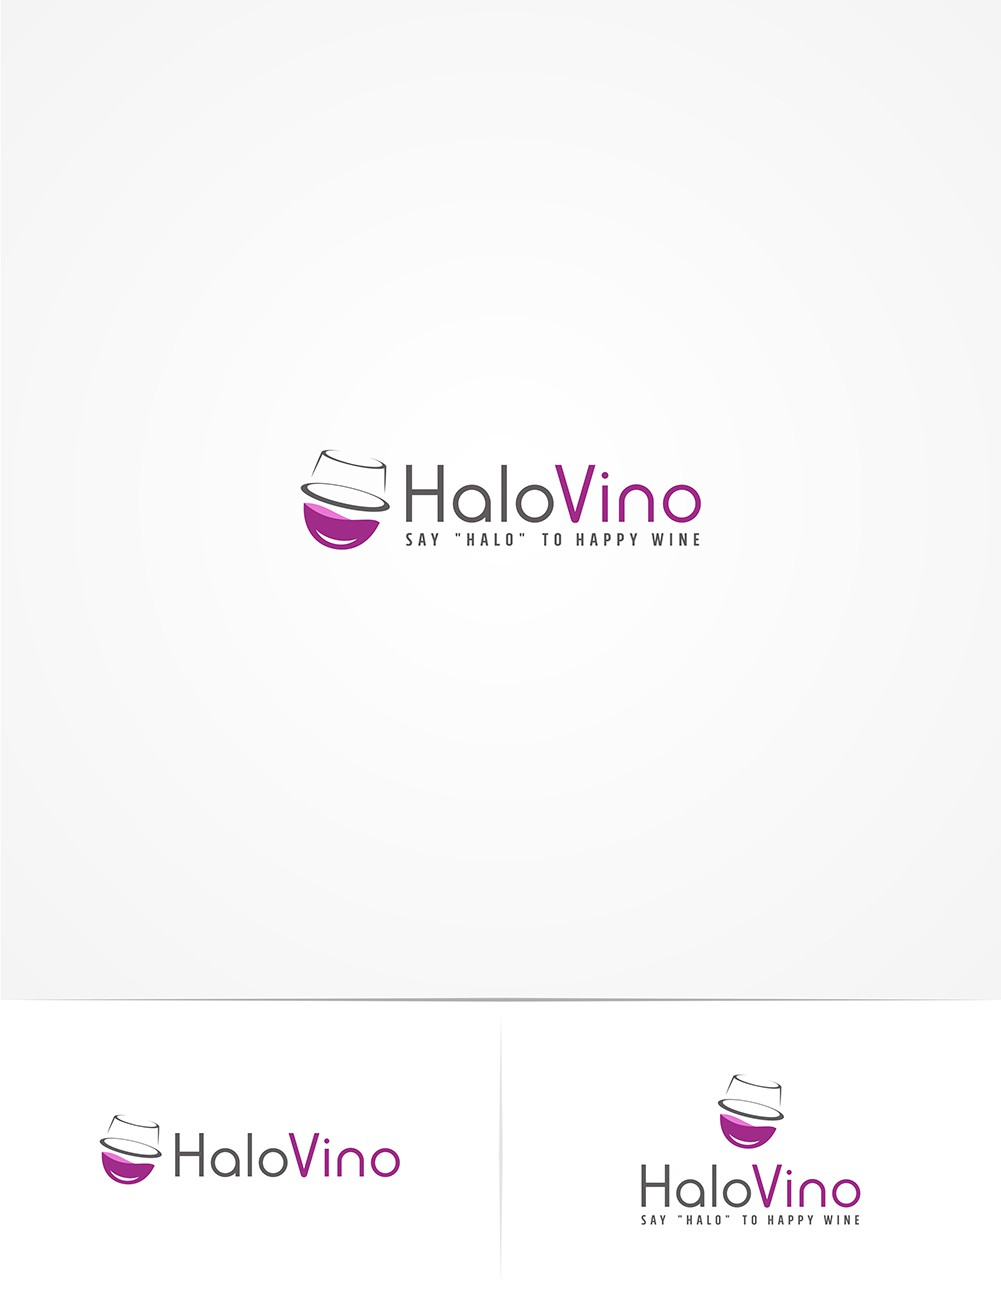 FUN WINE logo for patent-pending HaloVino's Kickstarter Campaign, potentially LOTS more work for winner